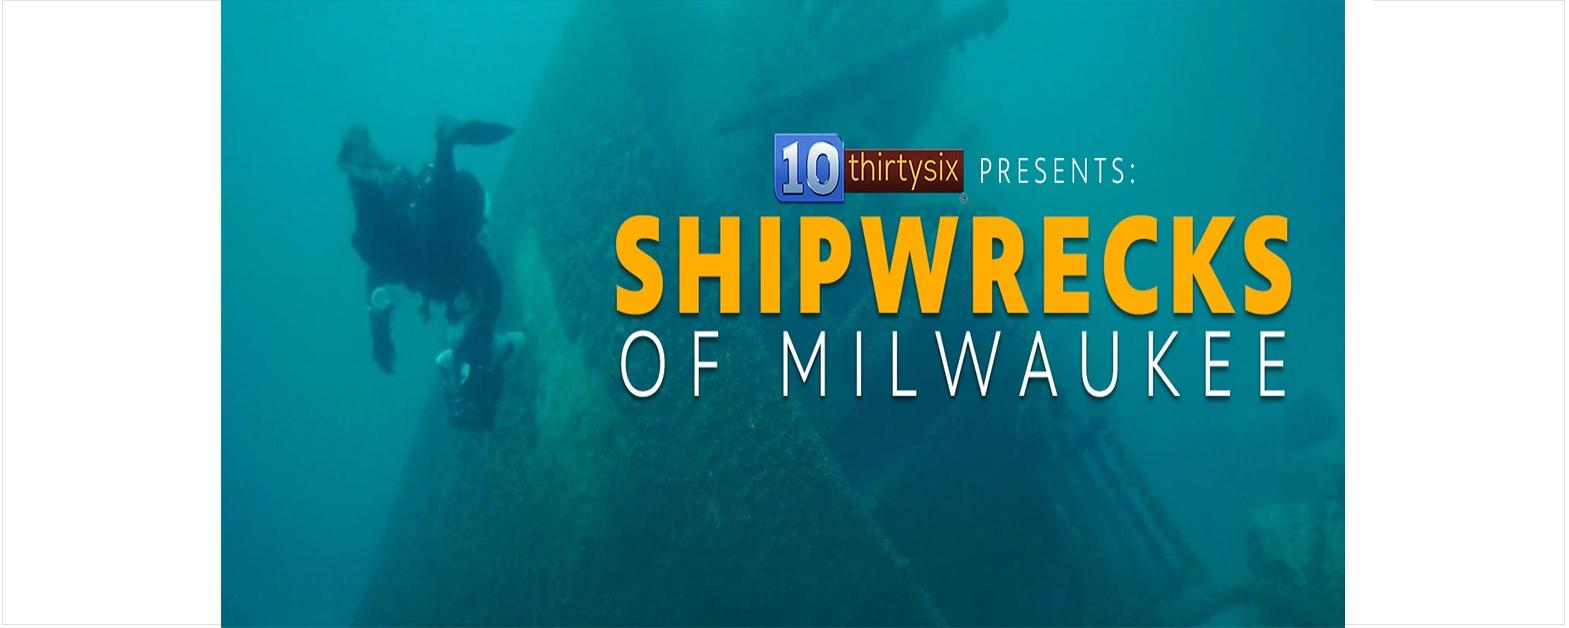 Shipwrecks of Milwaukee